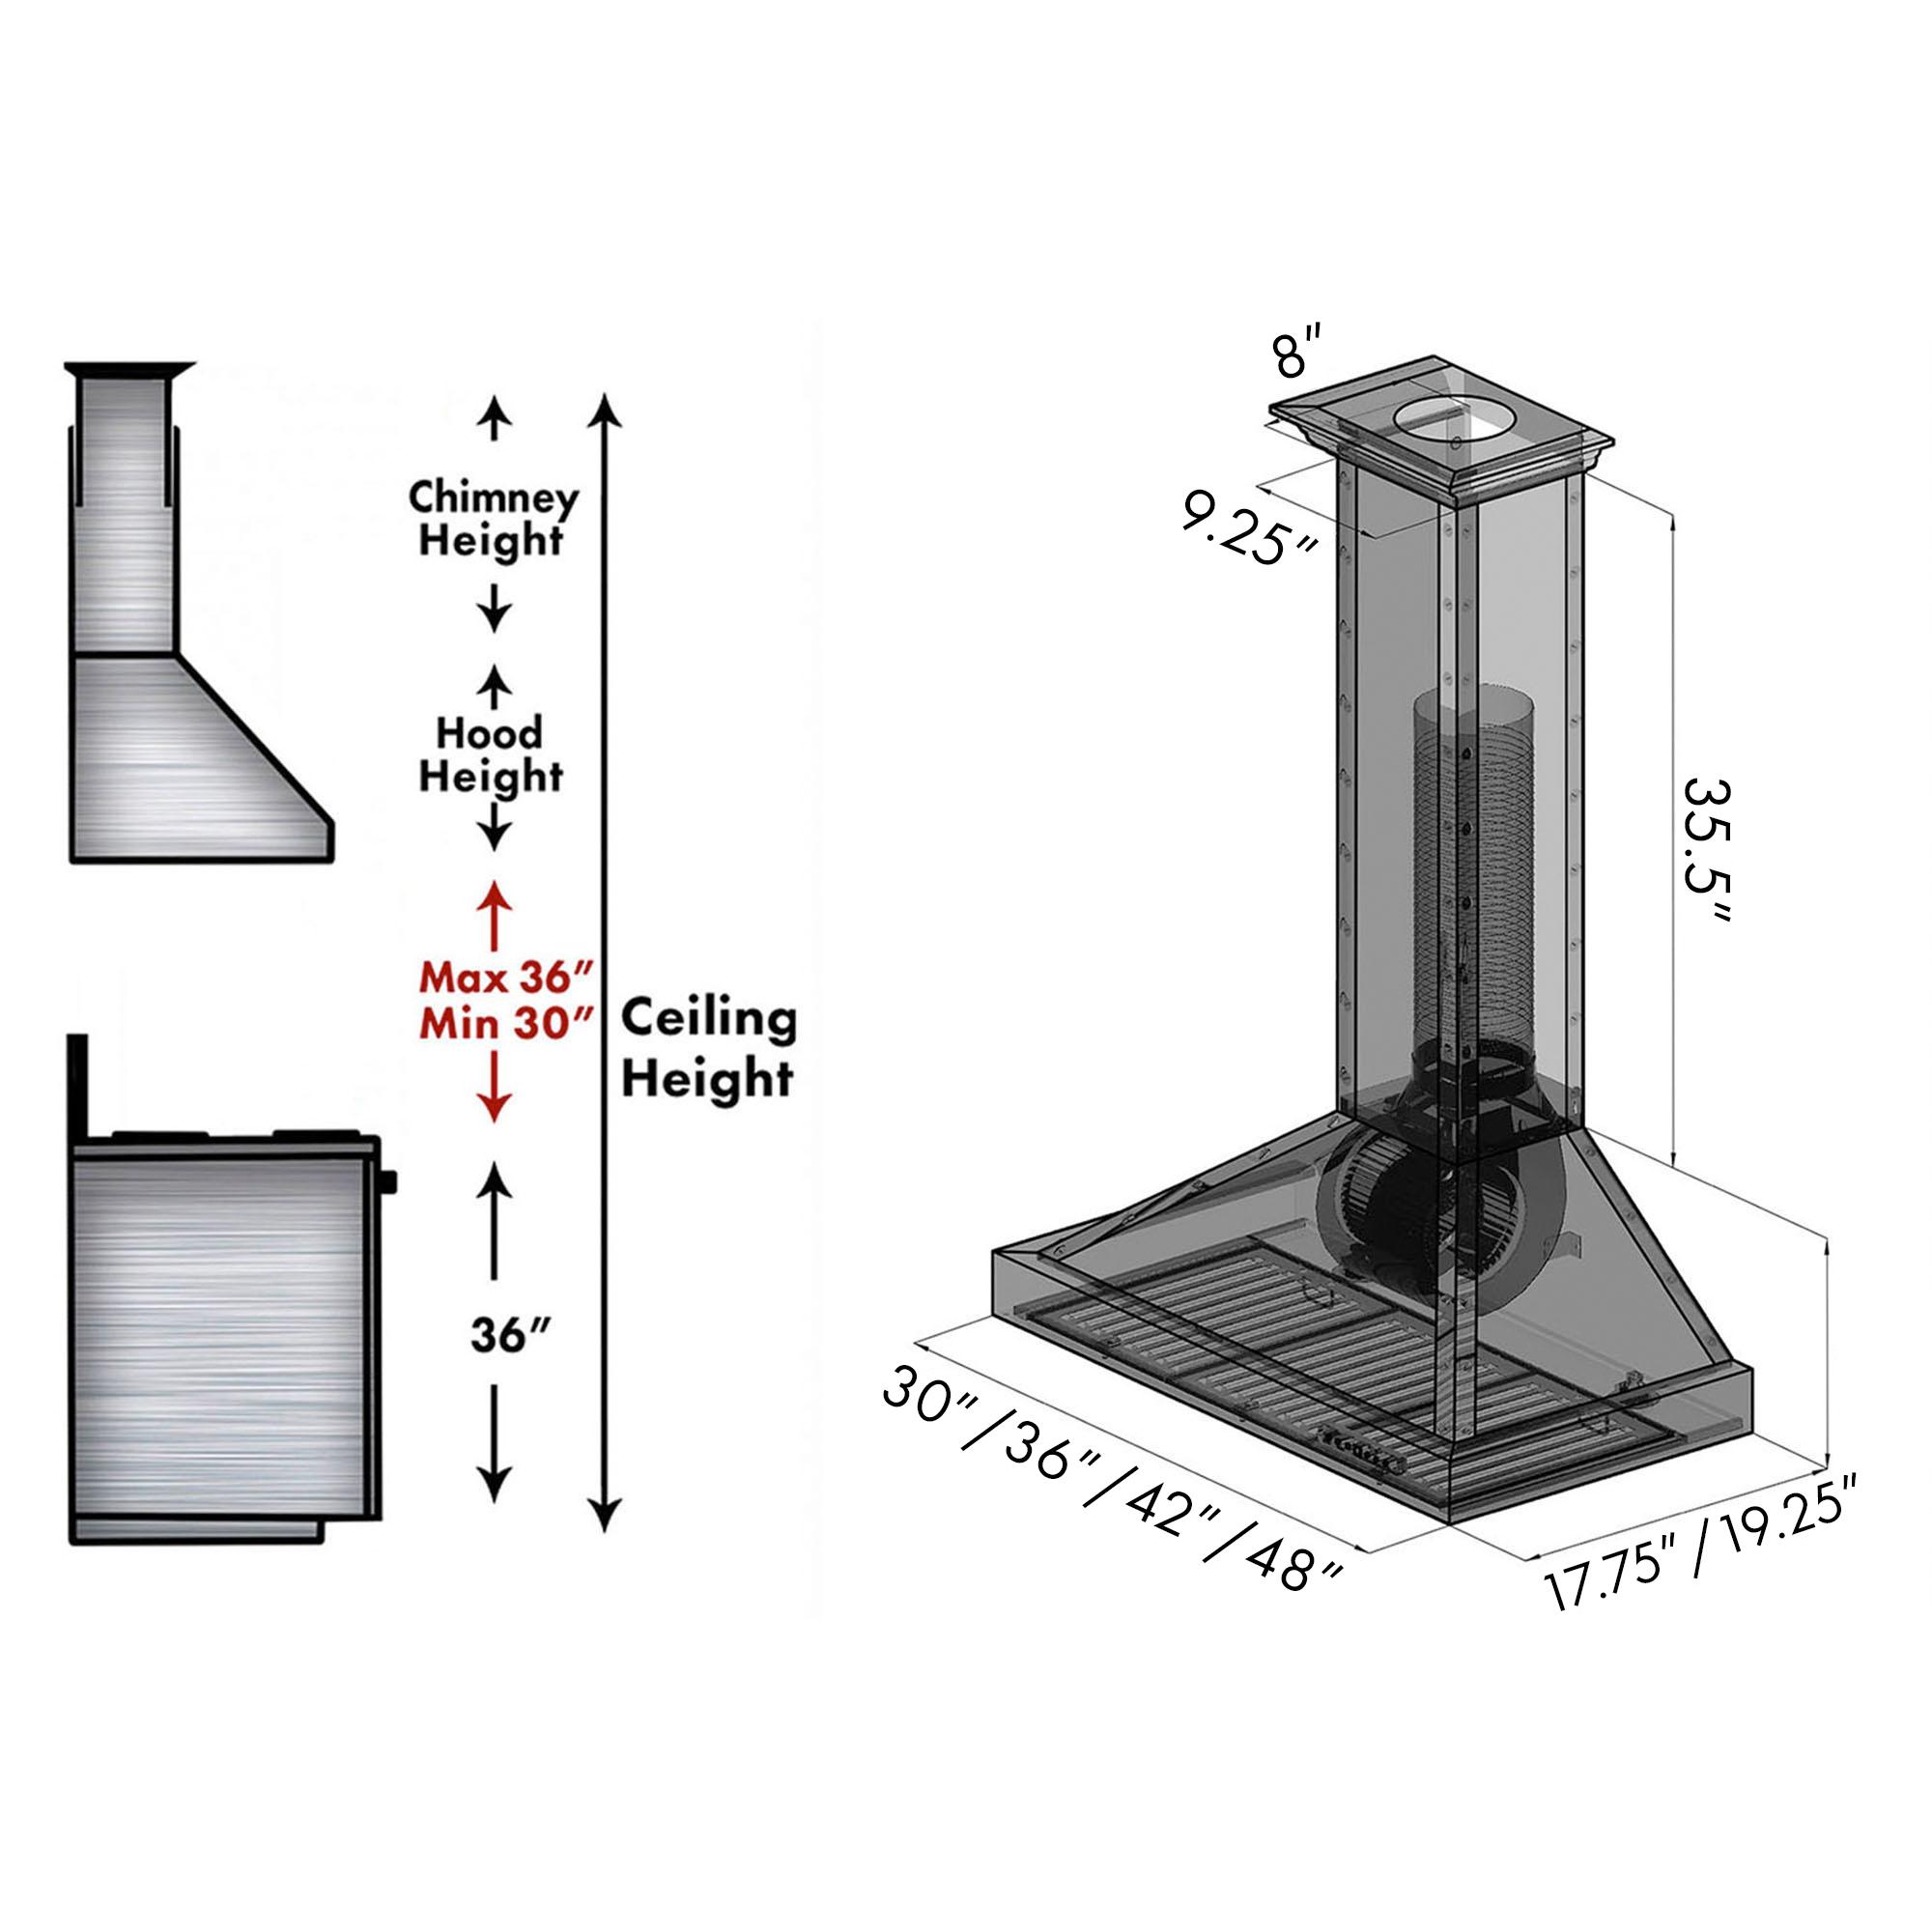 zline-copper-wall-mounted-range-hood-KB2-graphic_all.jpg